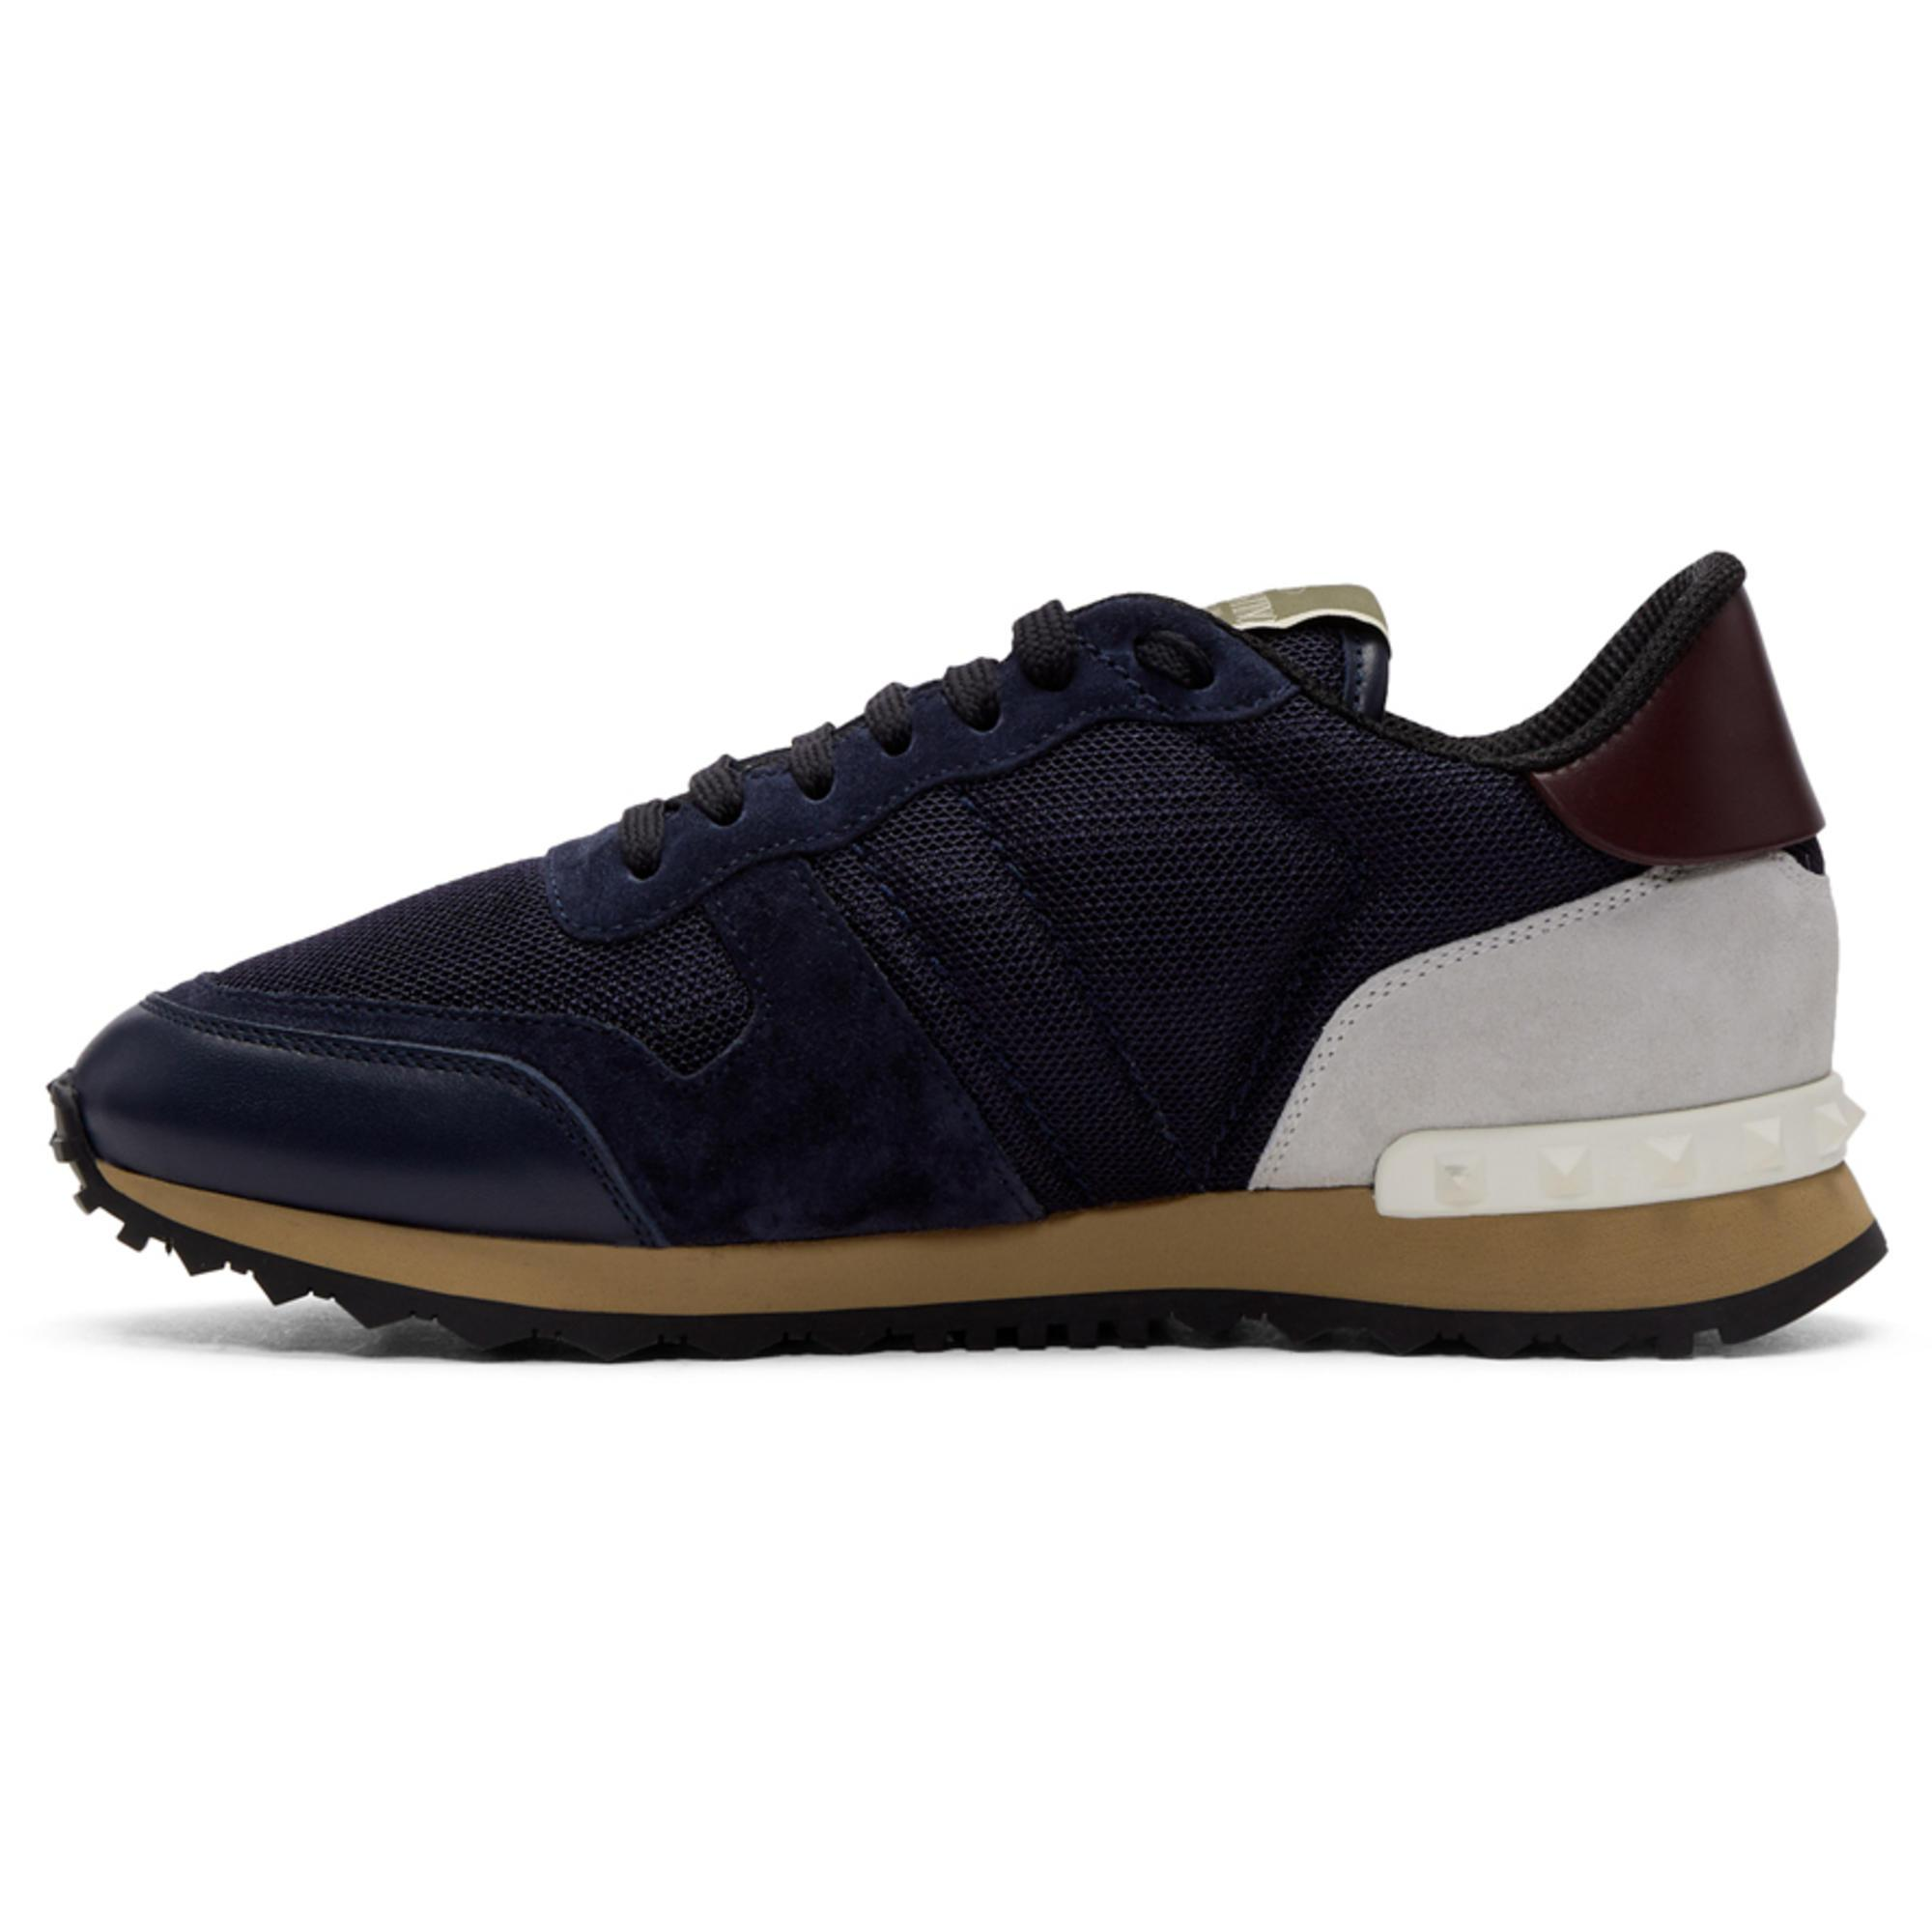 ValentinoNavy Garavani Mesh Rockrunner Sneakers HlVdJ8l